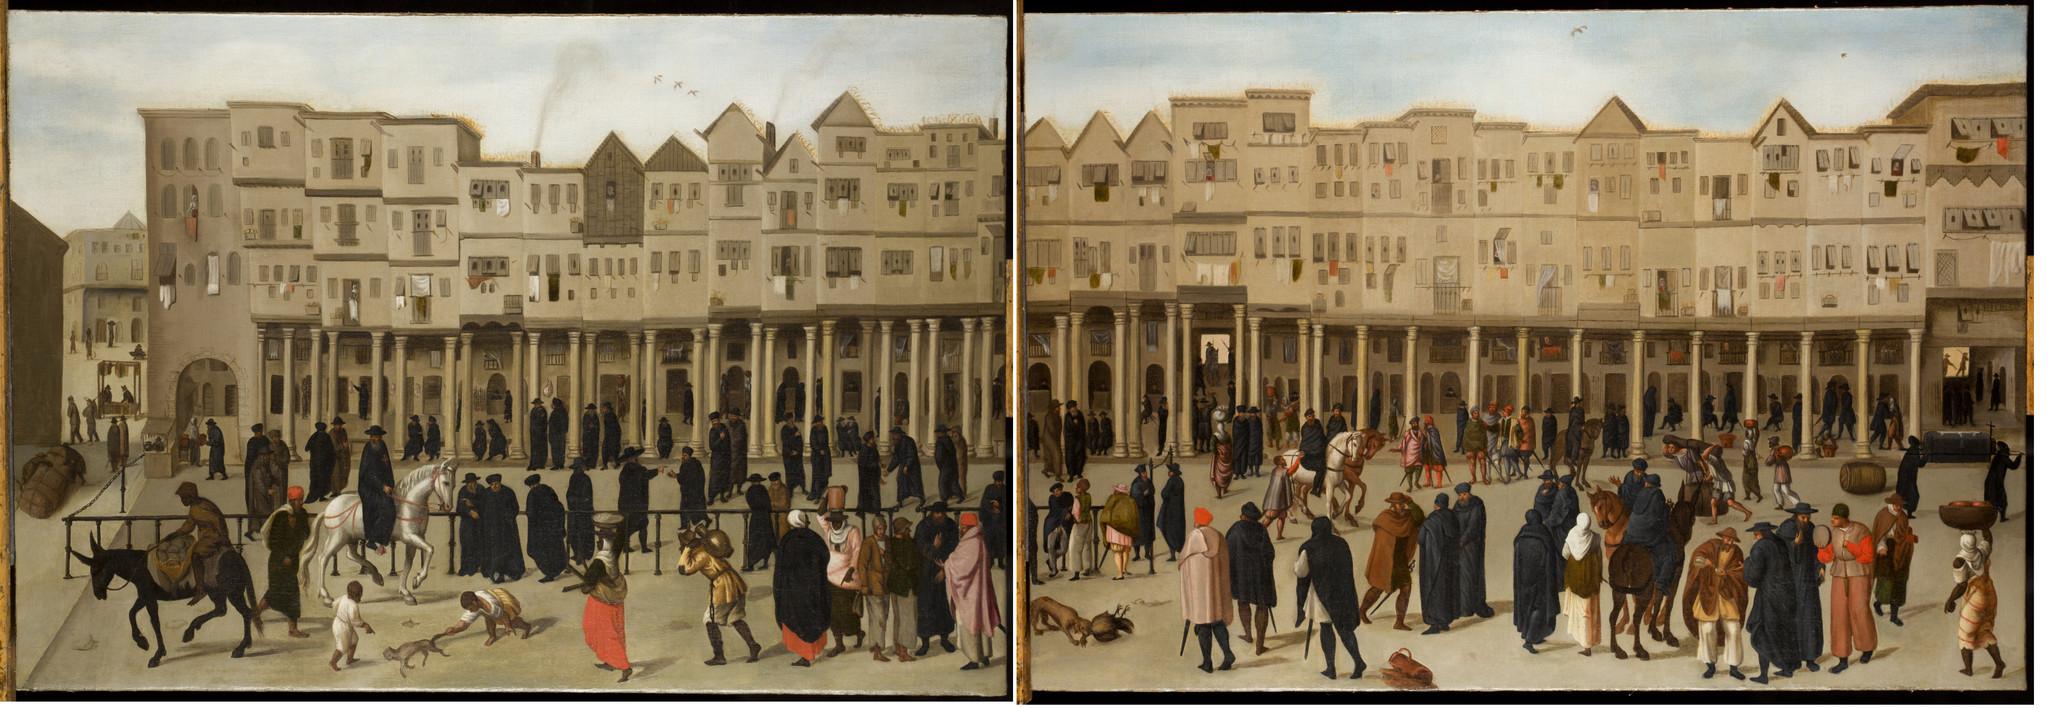 A CIDADE GLOBAL. Lisboa no Renascimento CAT_1 By kin juntos.jpg